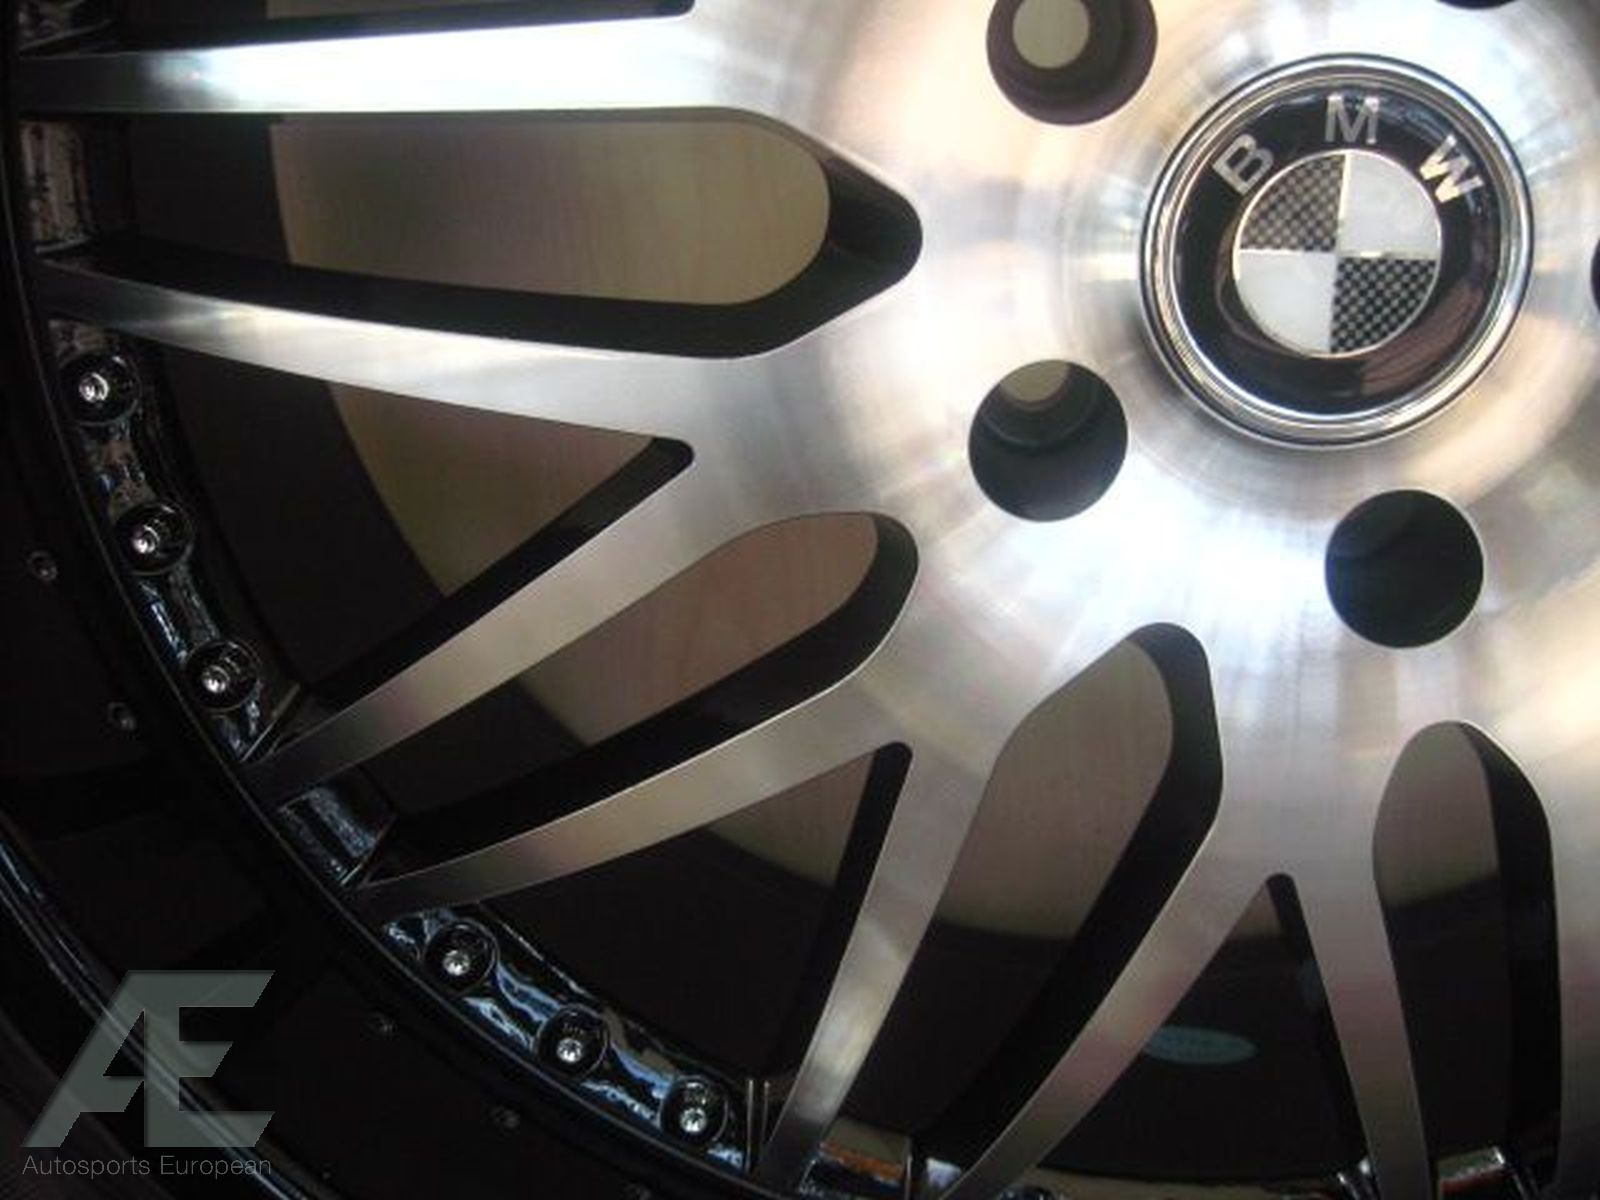 22 BMW Wheels Rim Tires 650i 645i M6 745i 750i 760i